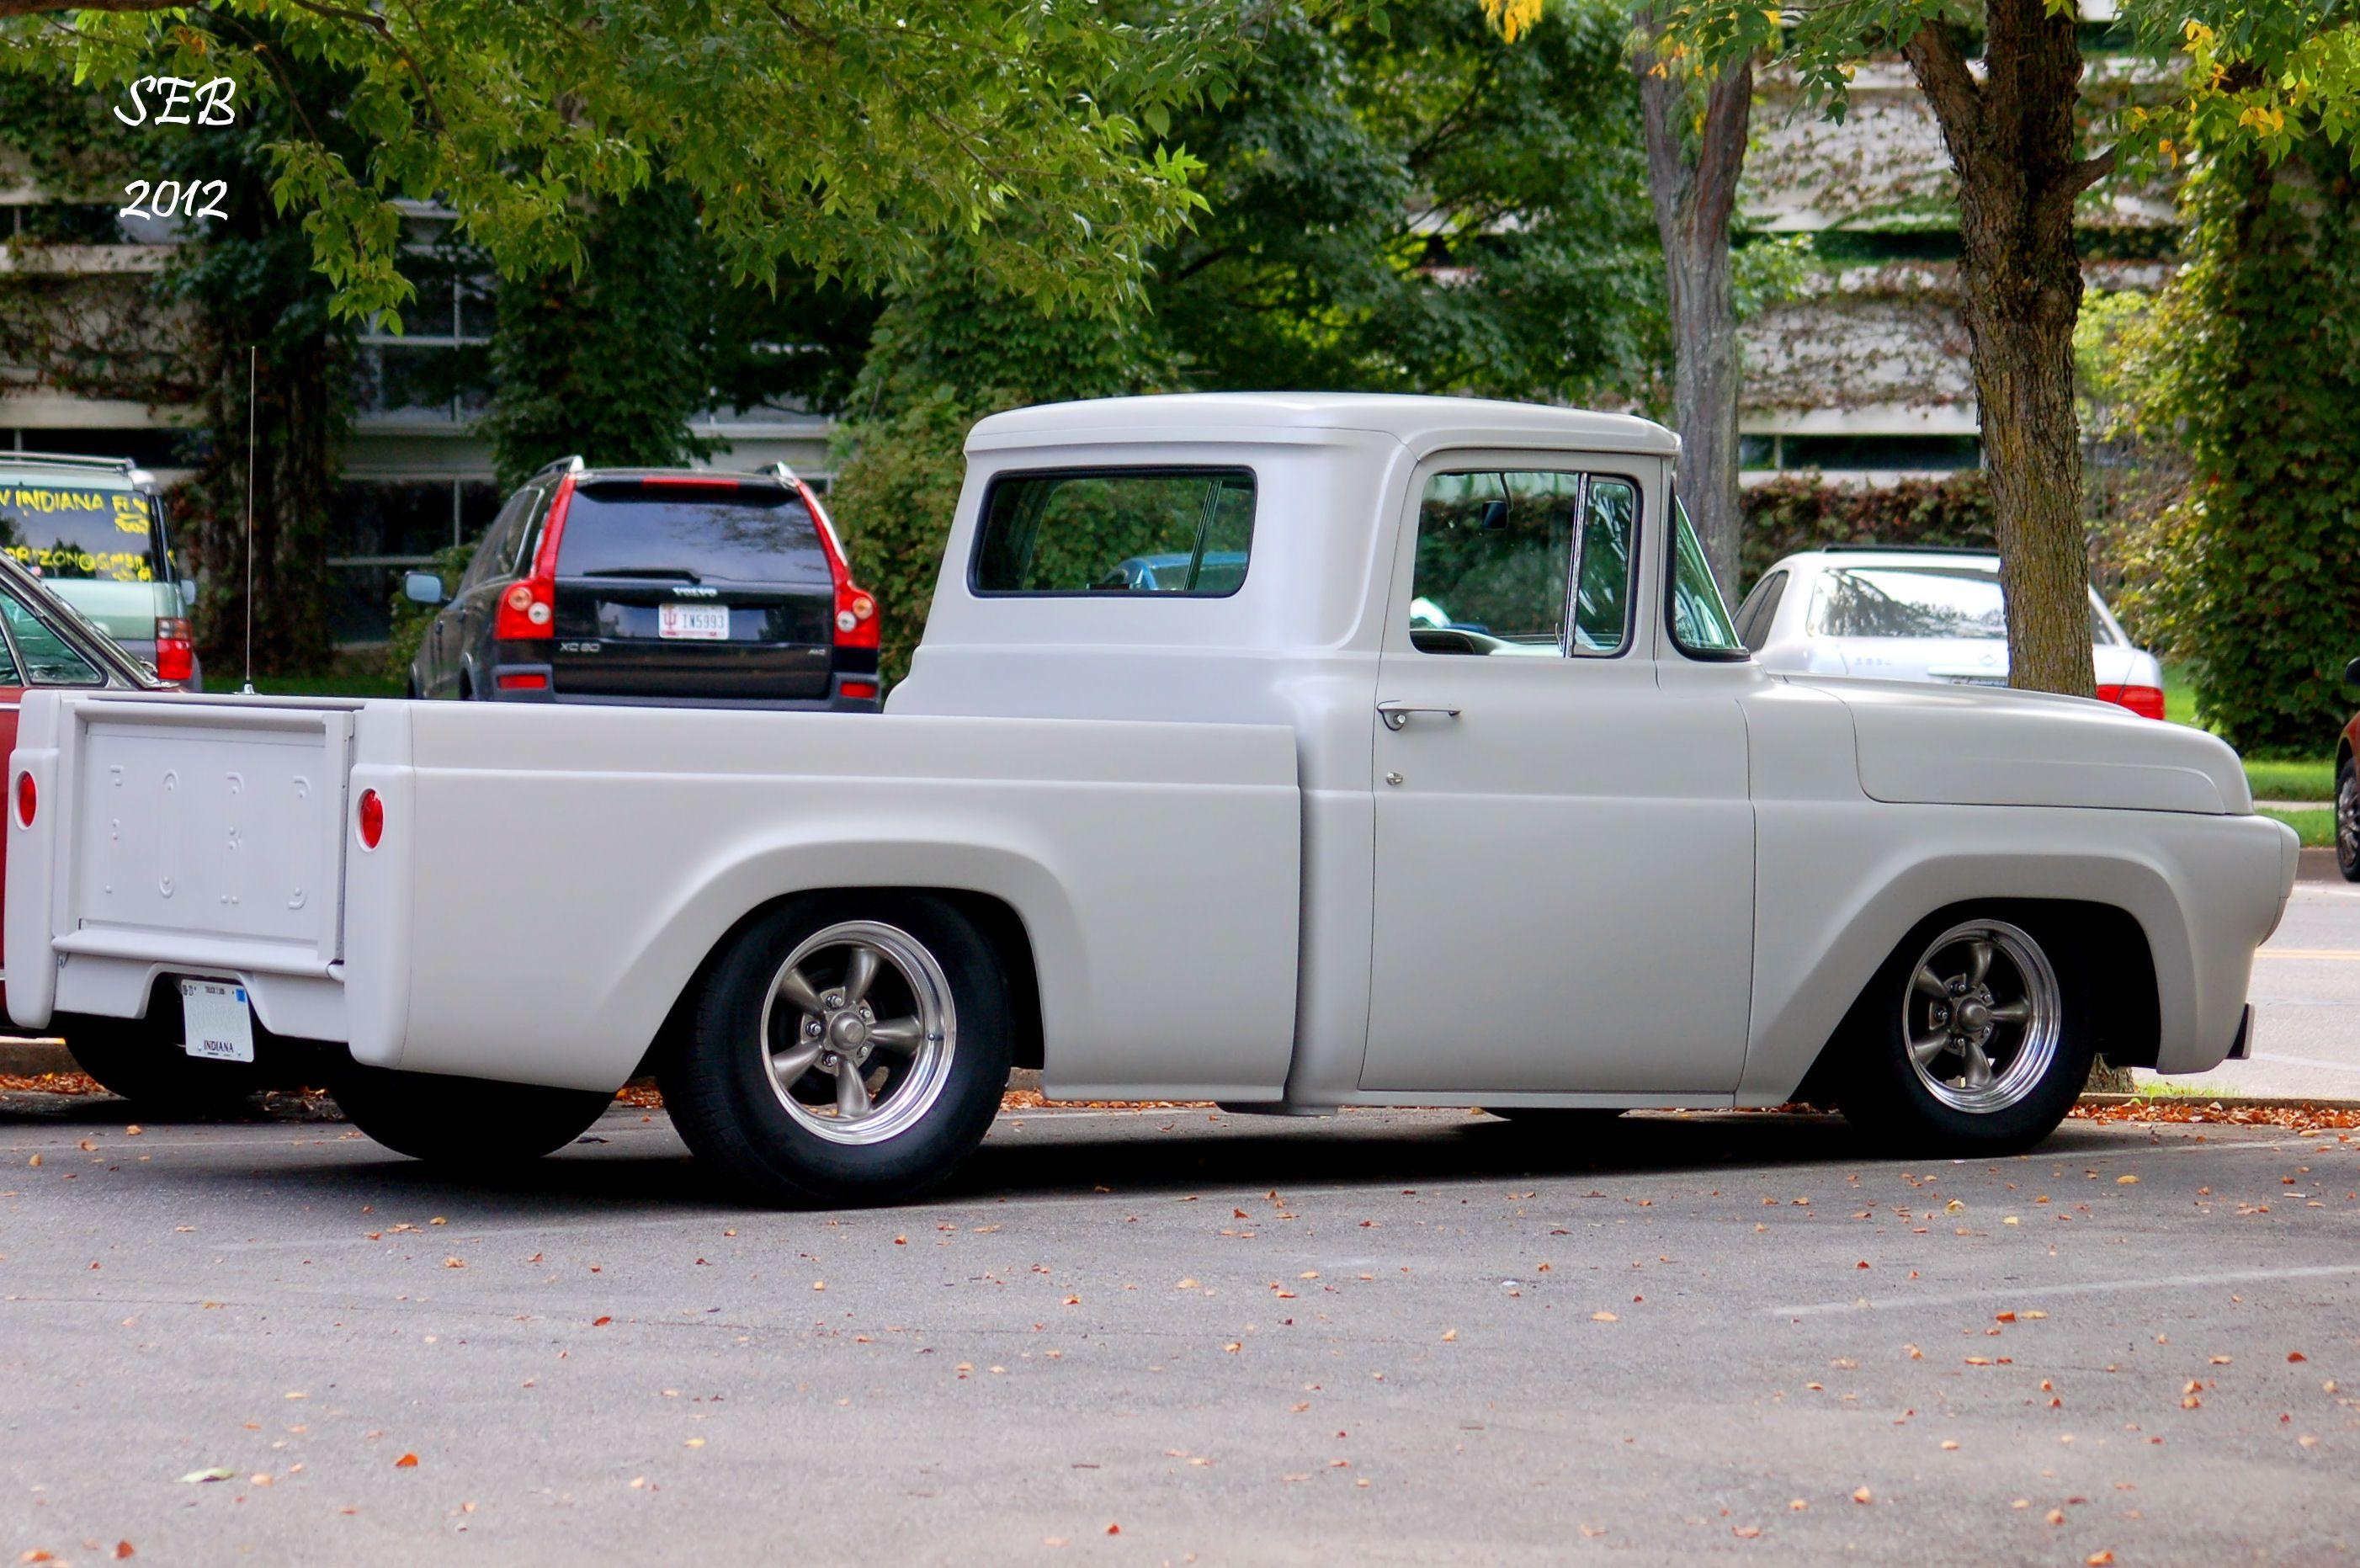 1957 Ford F100 Maintenance/restoration of old/vintage vehicles: the ...